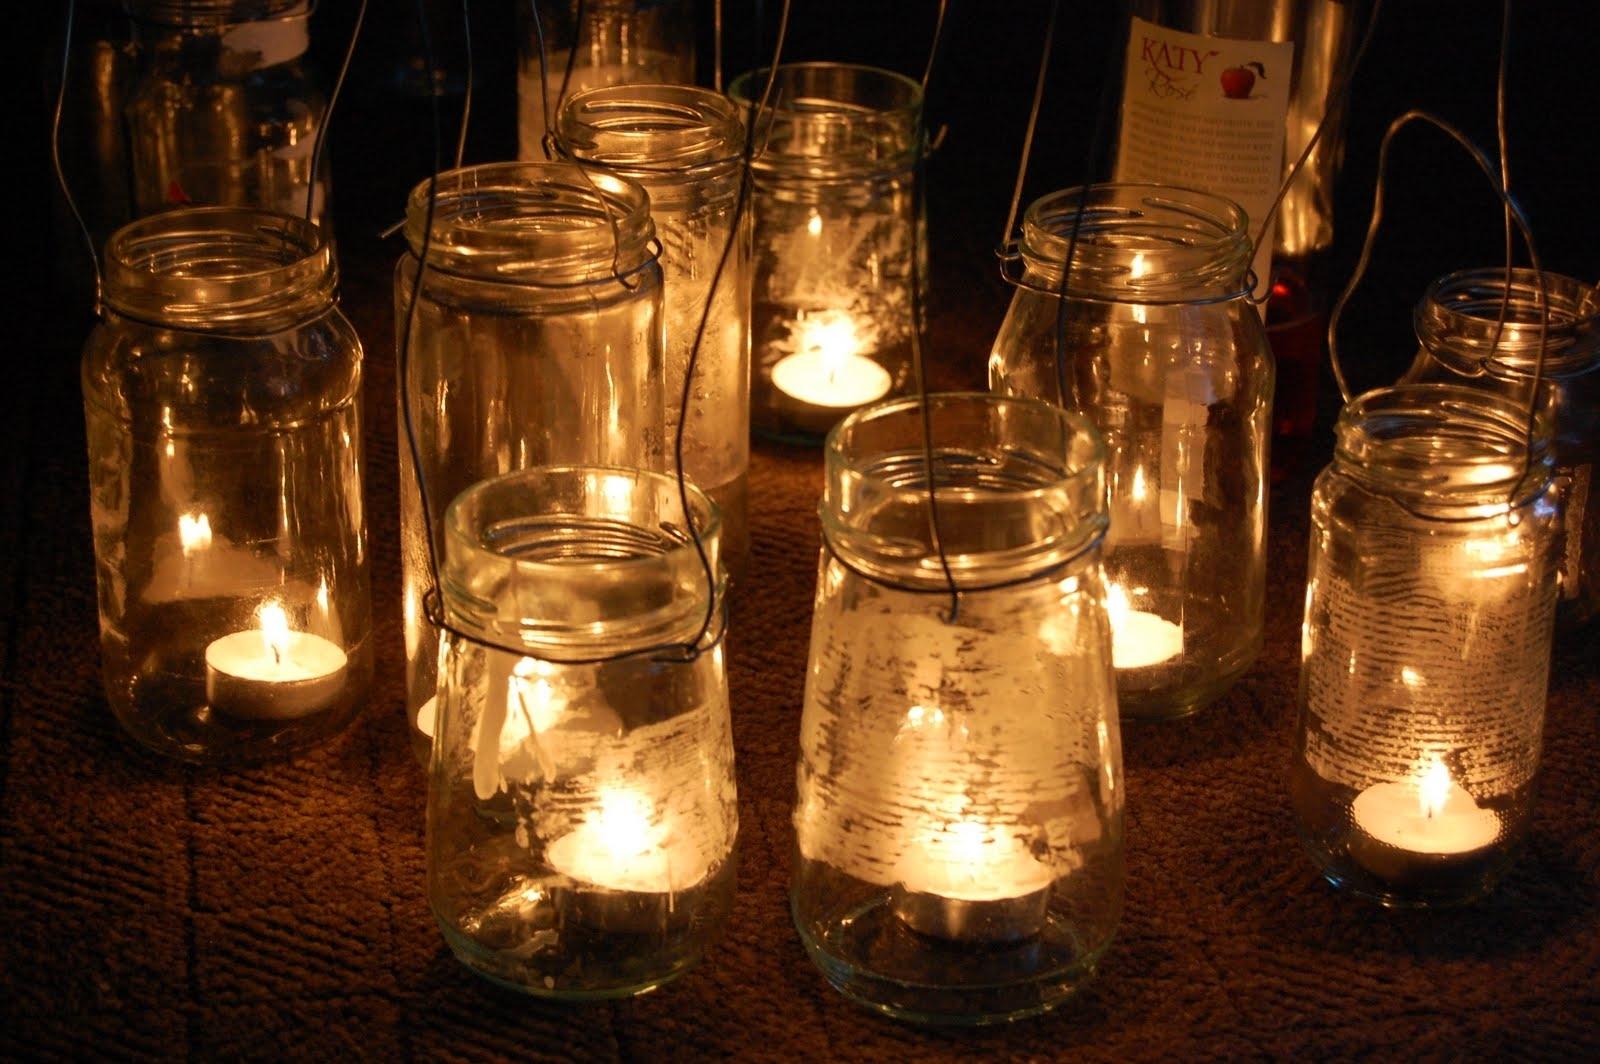 Simple Diy Rustic Hanging Mason Jar Candle Holder Lanterns For intended for Outdoor Jar Lanterns (Image 20 of 20)